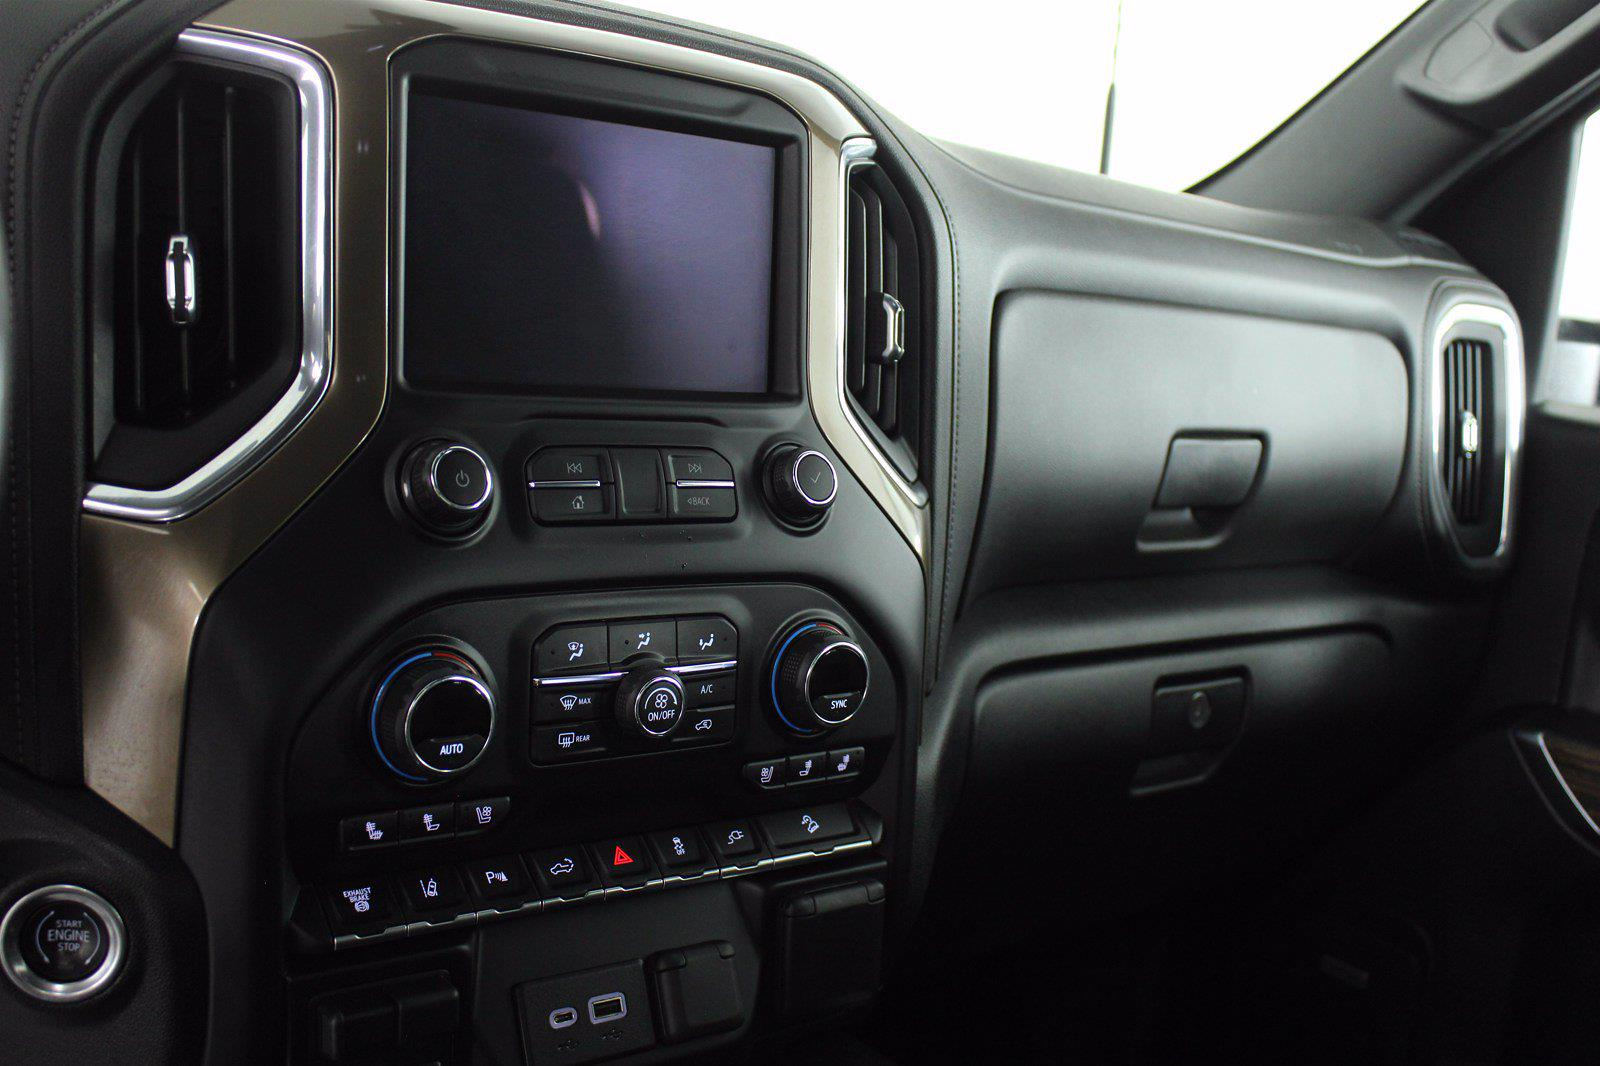 2020 Chevrolet Silverado 3500 Crew Cab 4x4, Pickup #DAZ0421 - photo 6